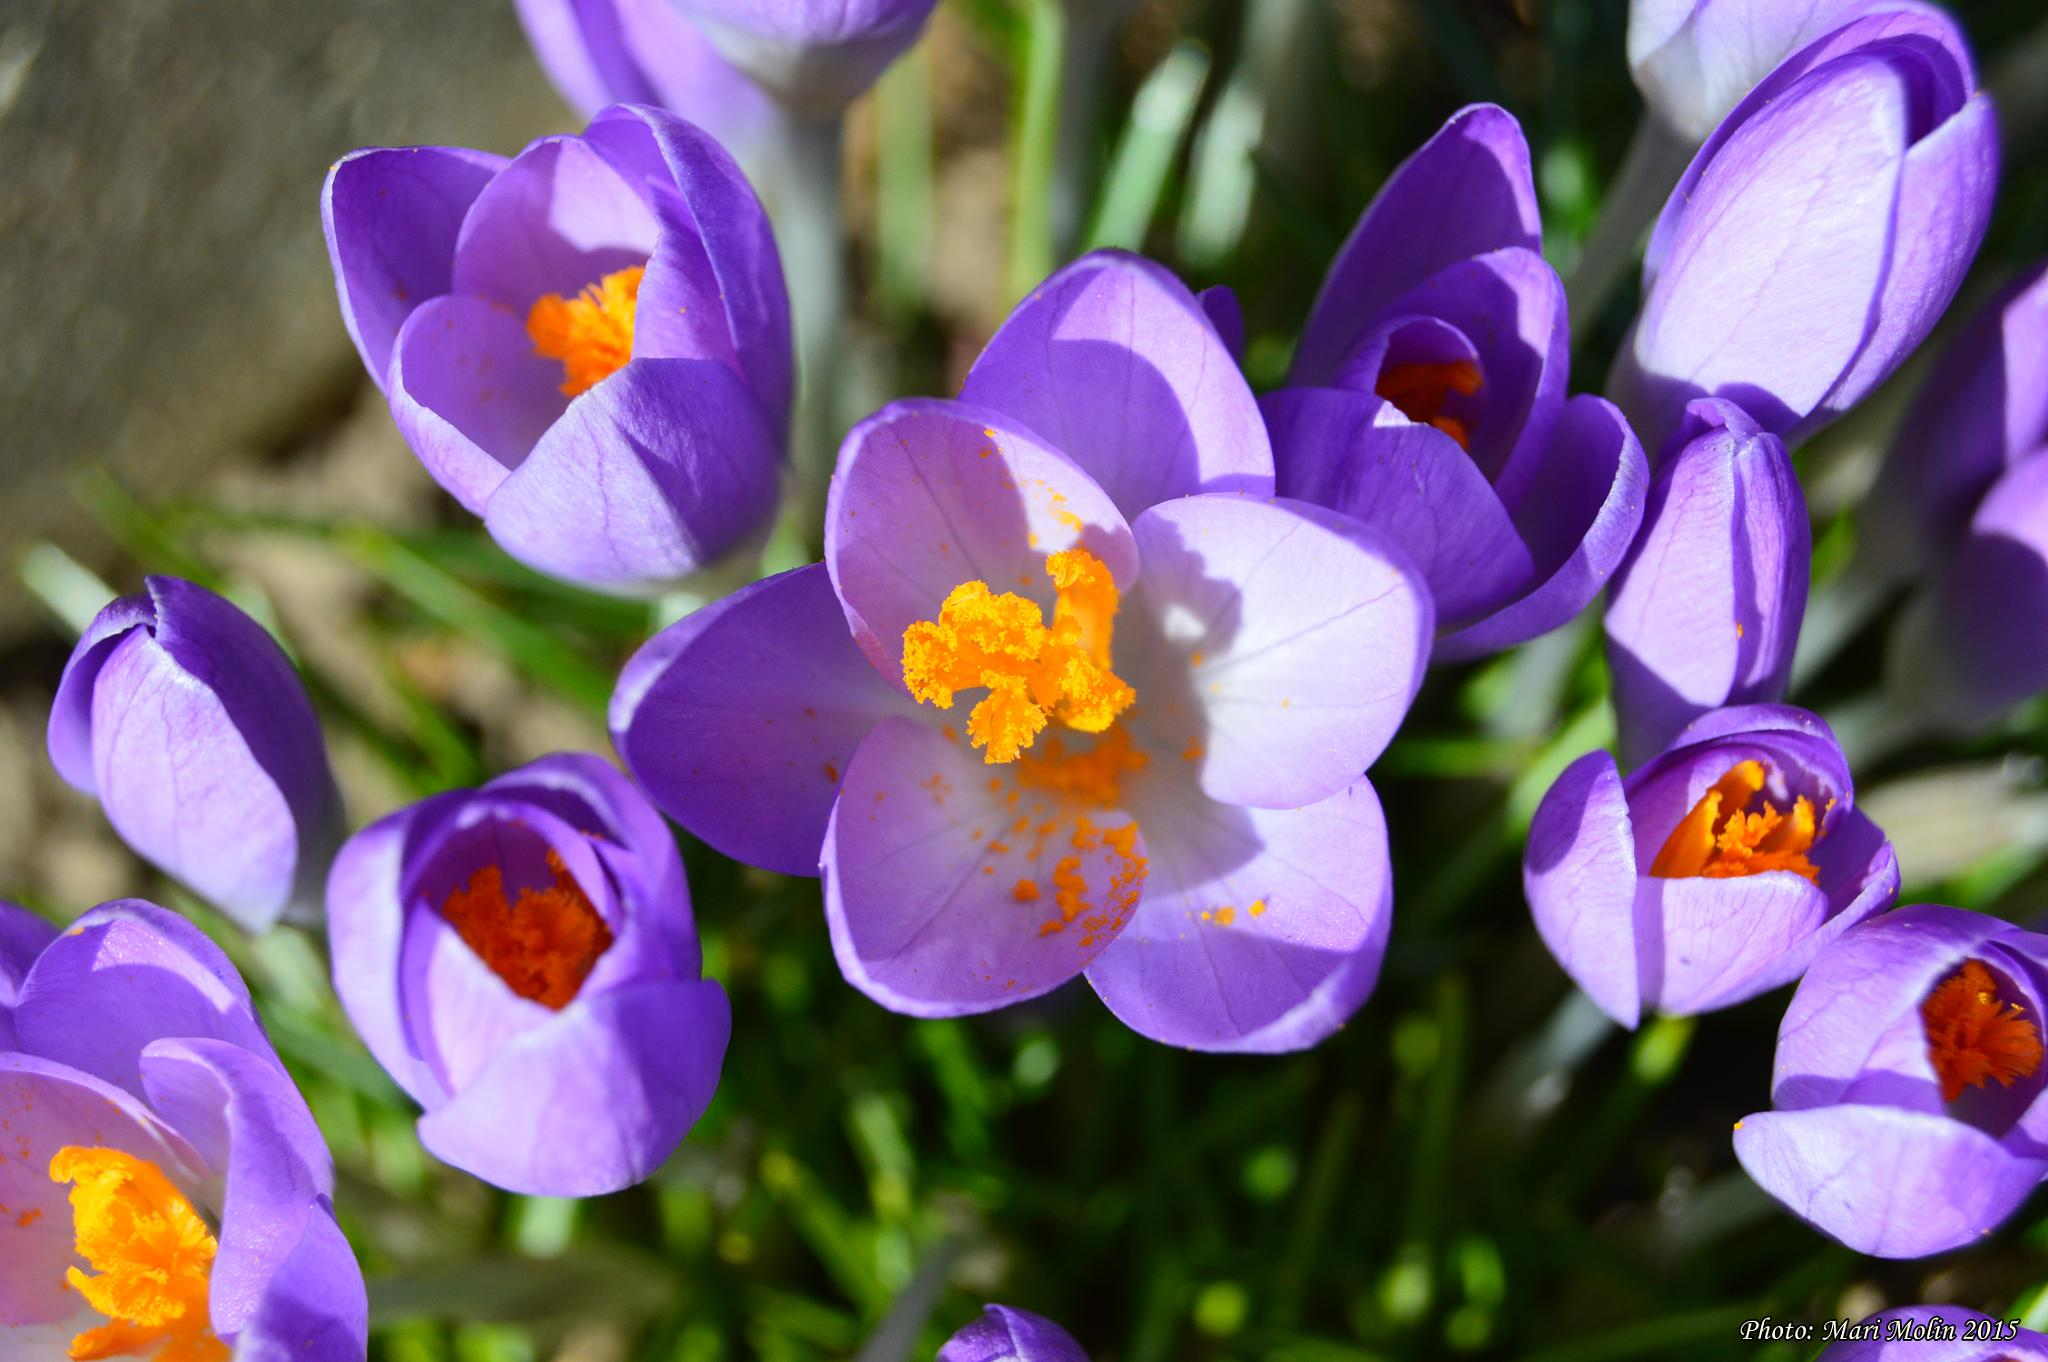 Spring = Crocus flower by Mari Molin